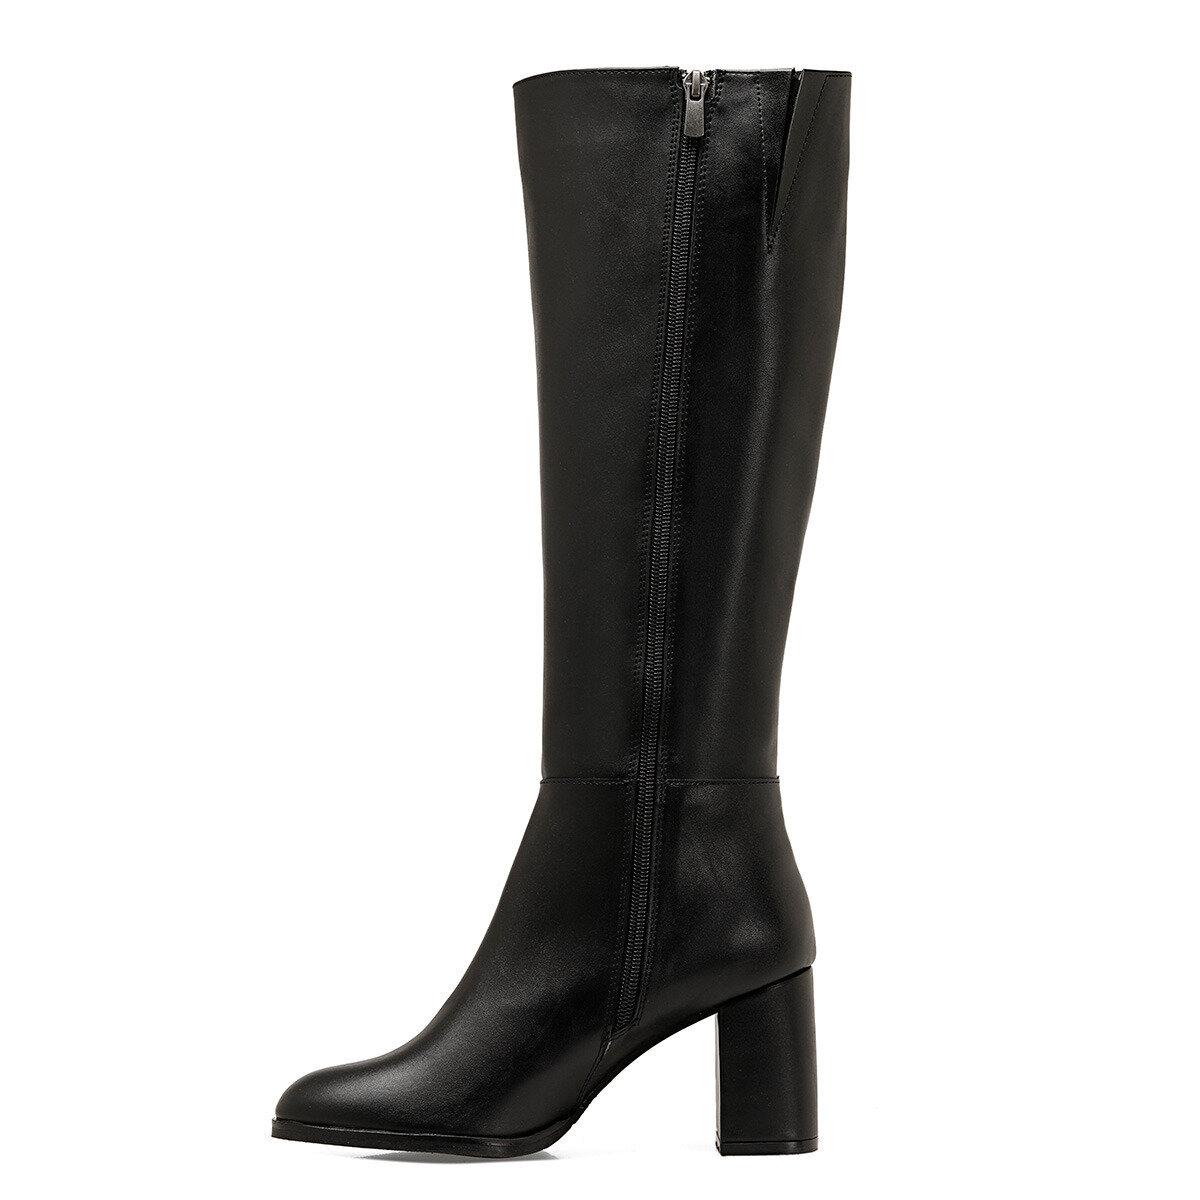 SETRA Siyah Kadın Topuklu Çizme